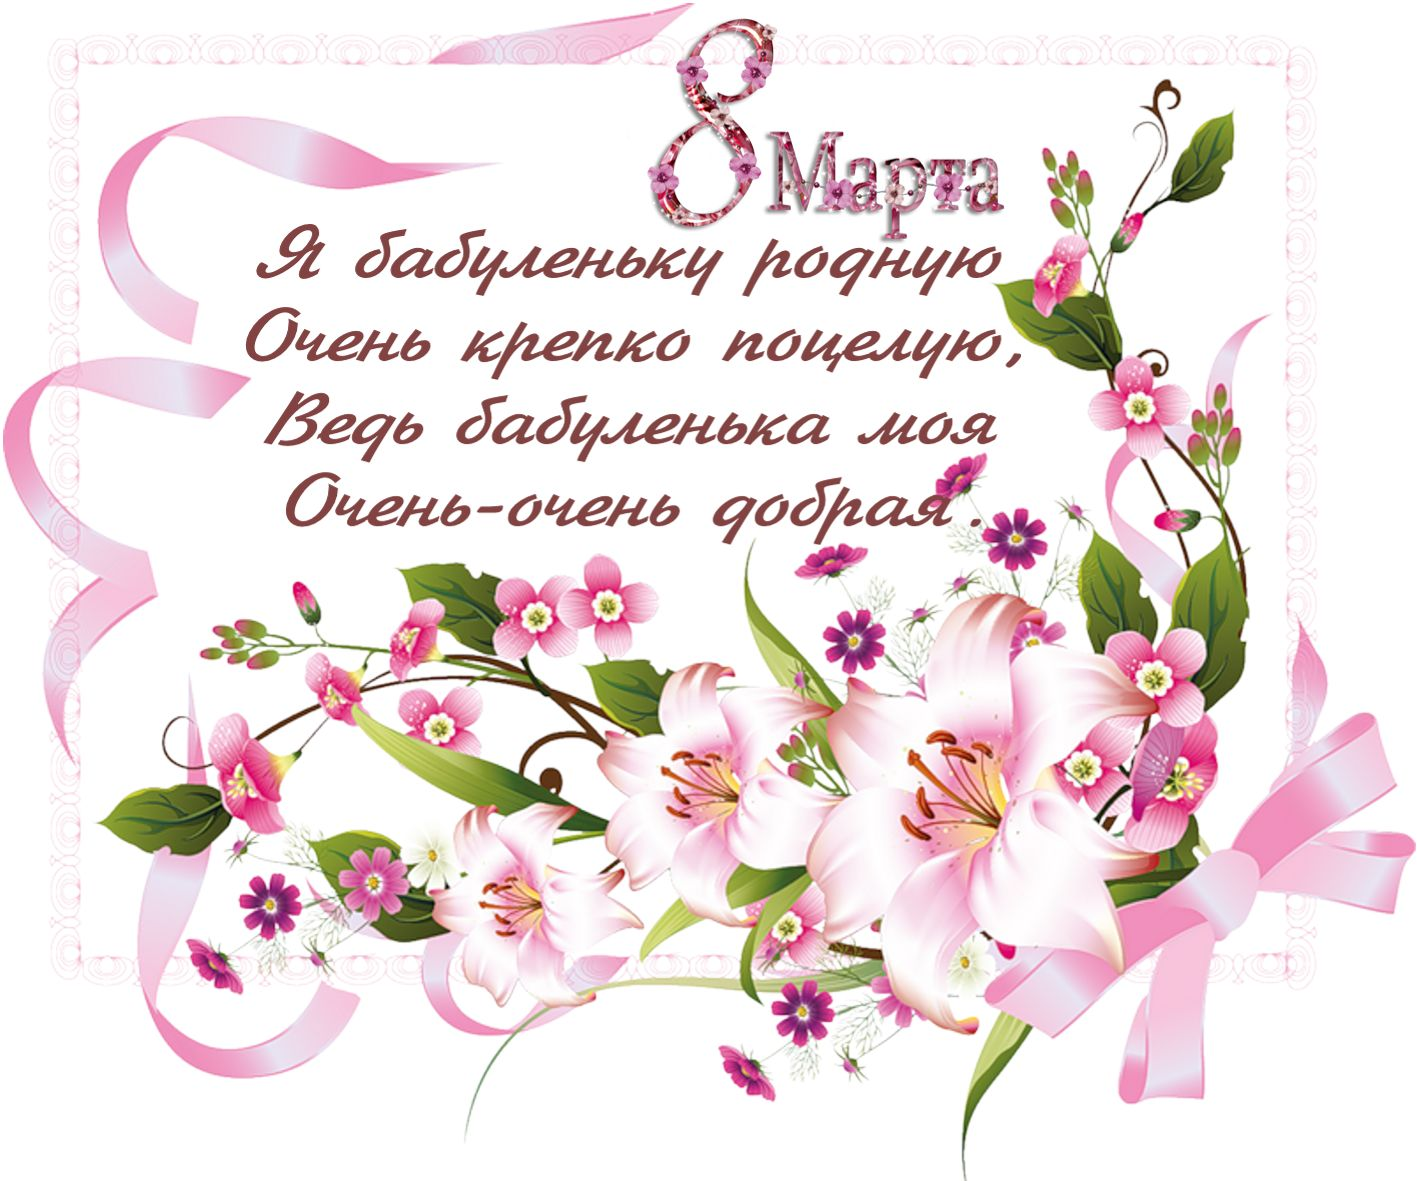 http://img-fotki.yandex.ru/get/9263/97761520.4b6/0_8f303_646b8541_orig.jpg